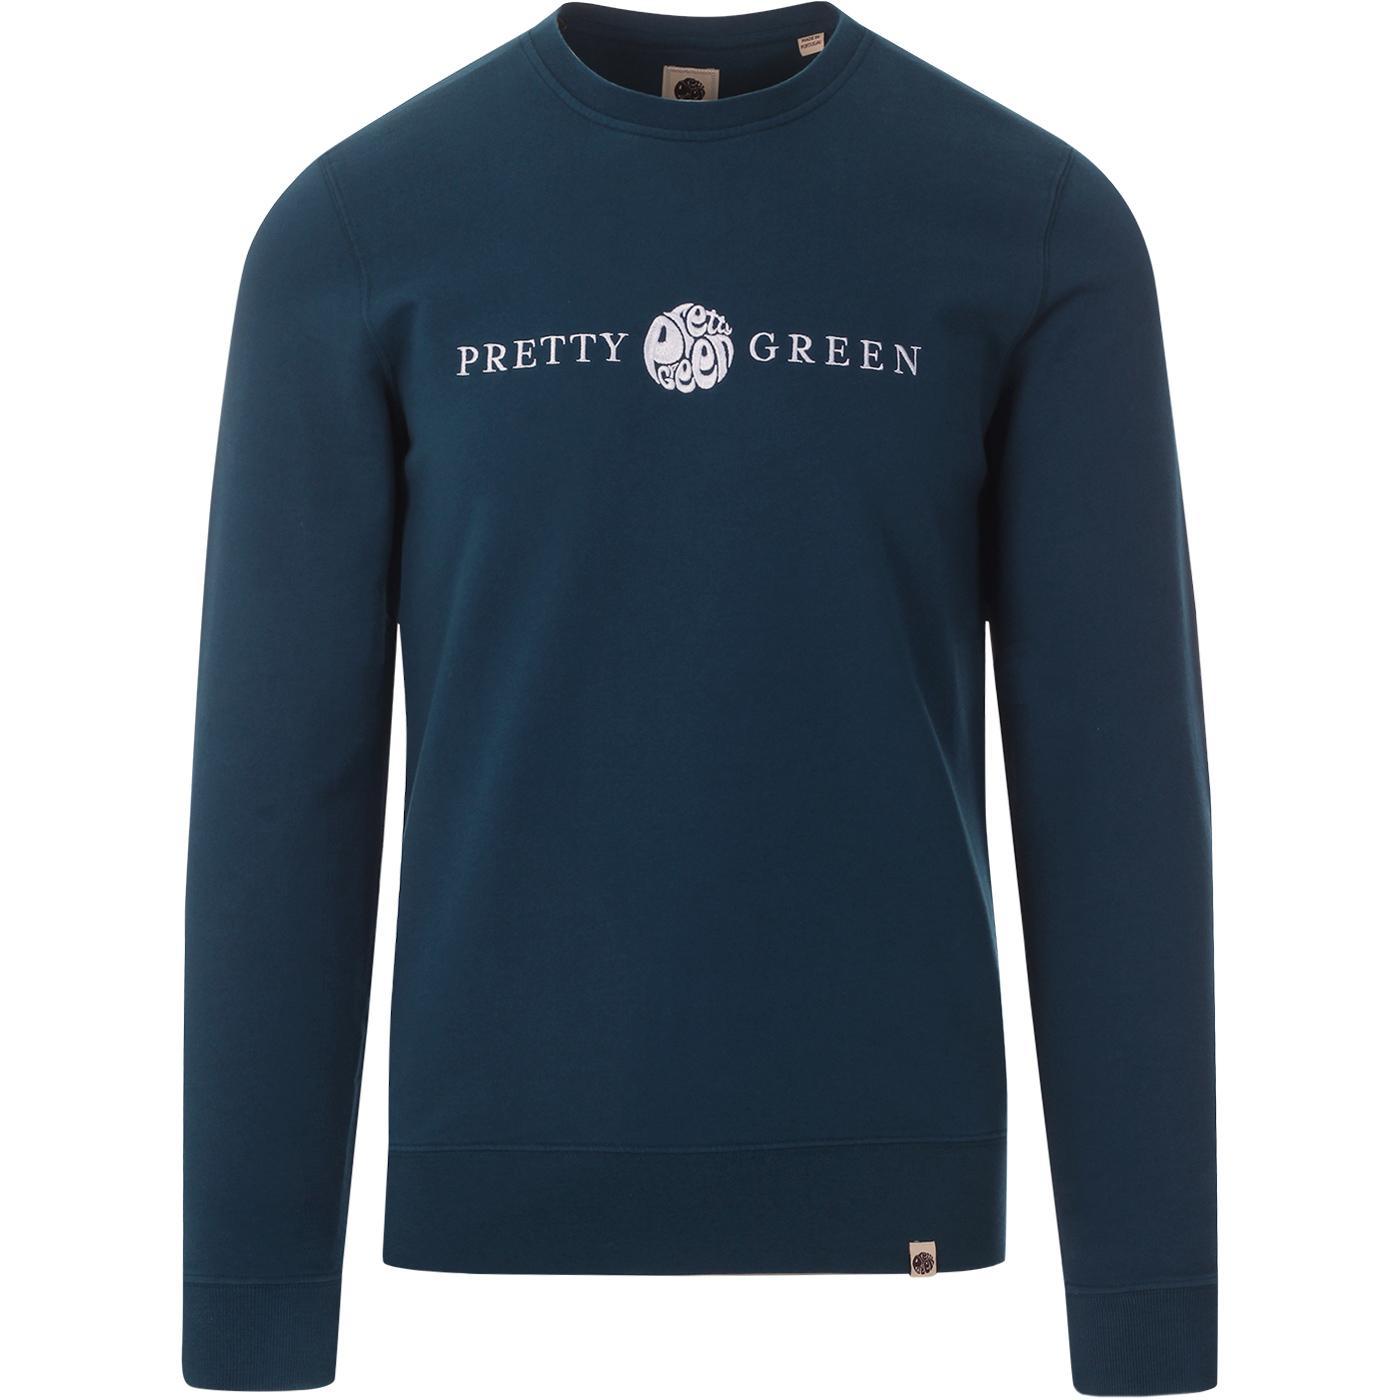 PRETTY GREEN Retro Embroidered Logo Sweatshirt (N)